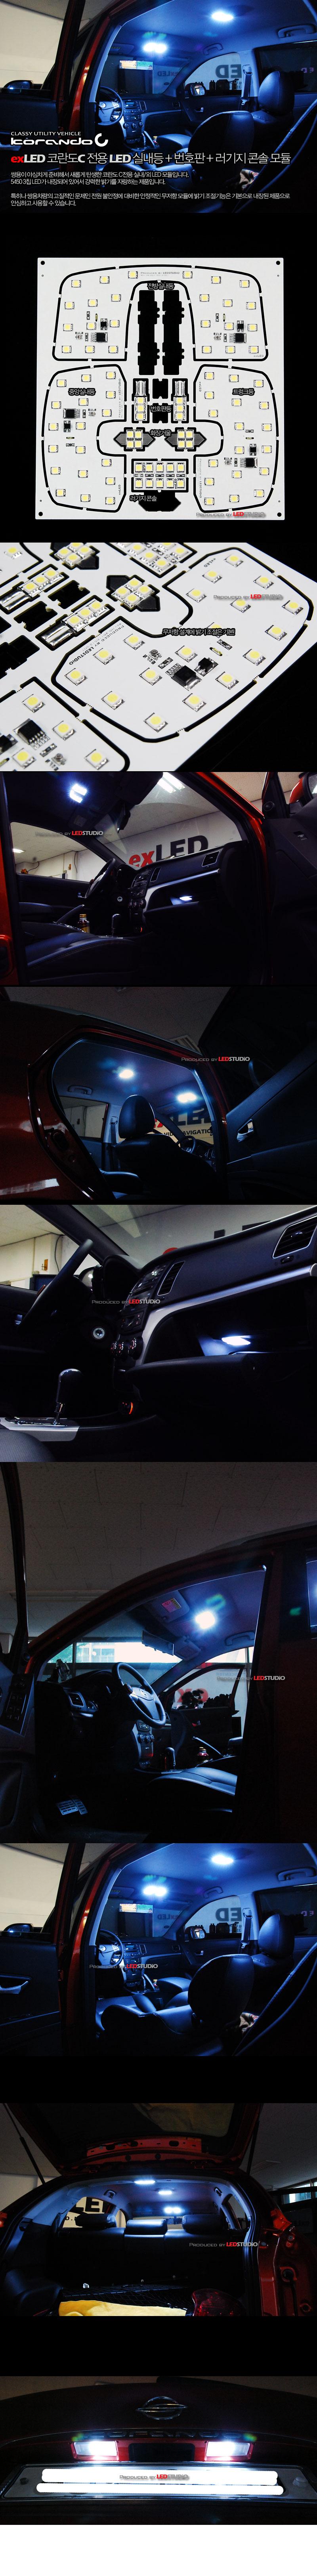 exLED 코란도C용 실내등+번호판+화장거울+러기지콘솔 LED 풀셋트